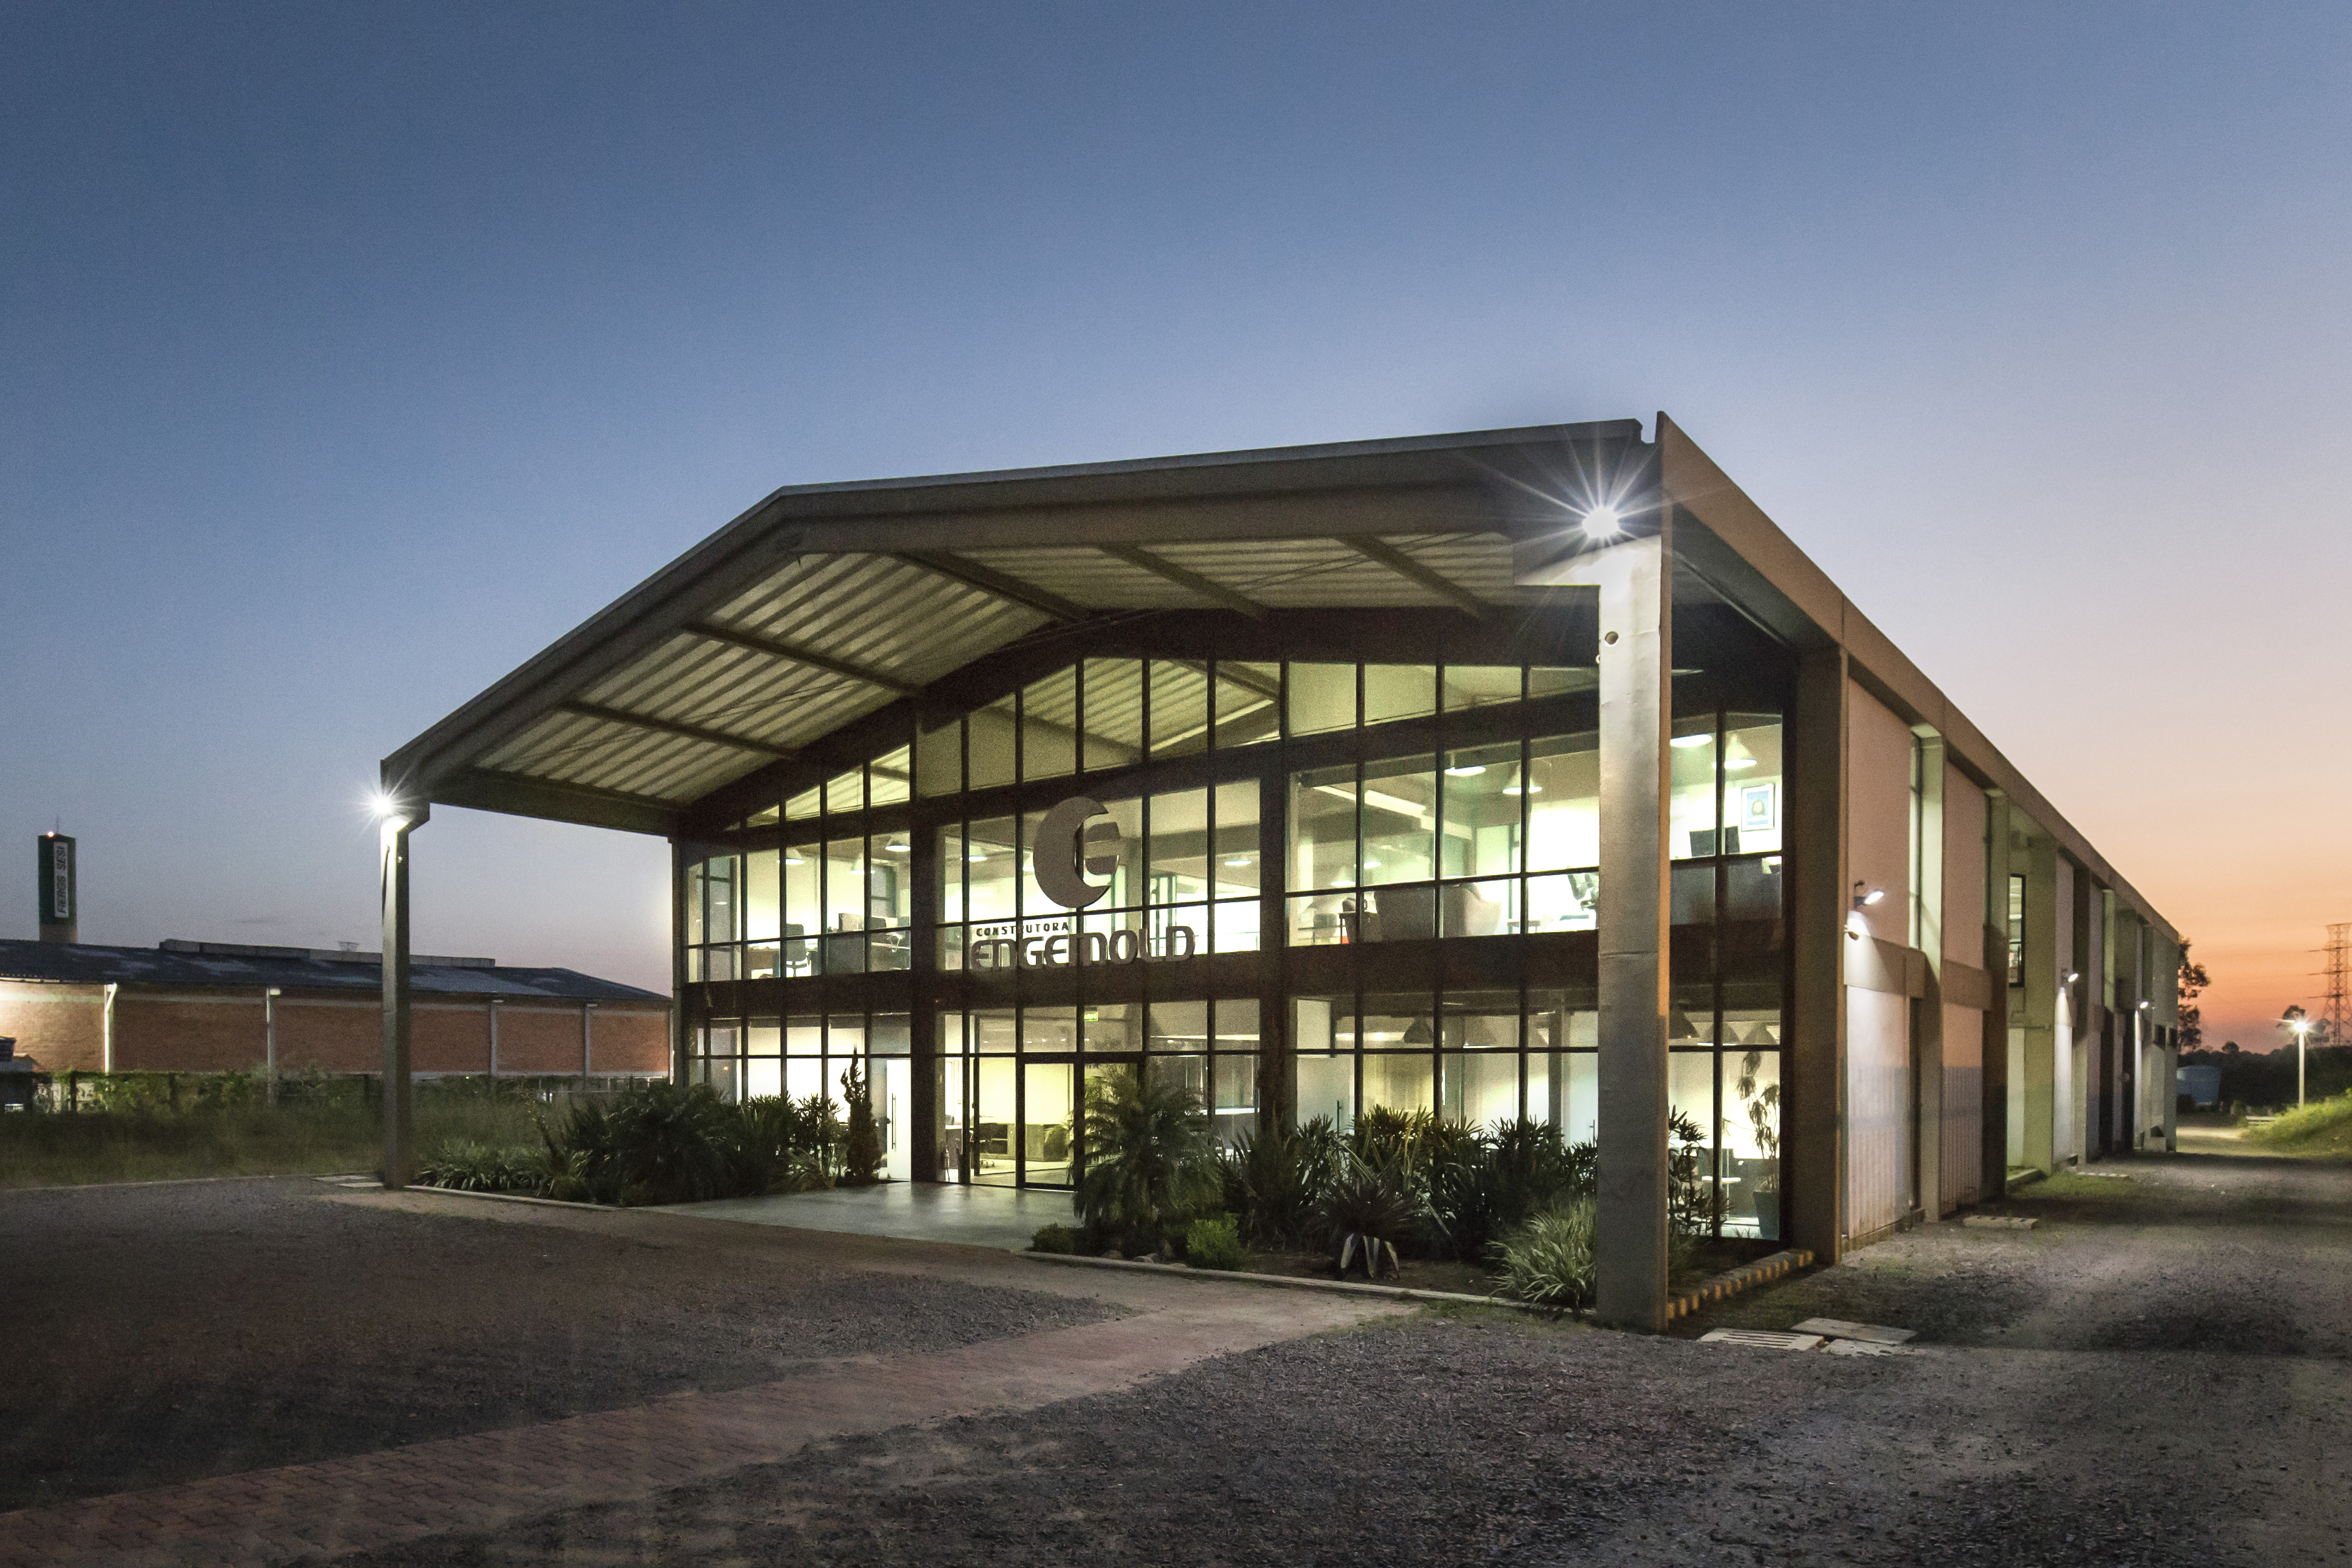 Engemold Headquarters - Facade